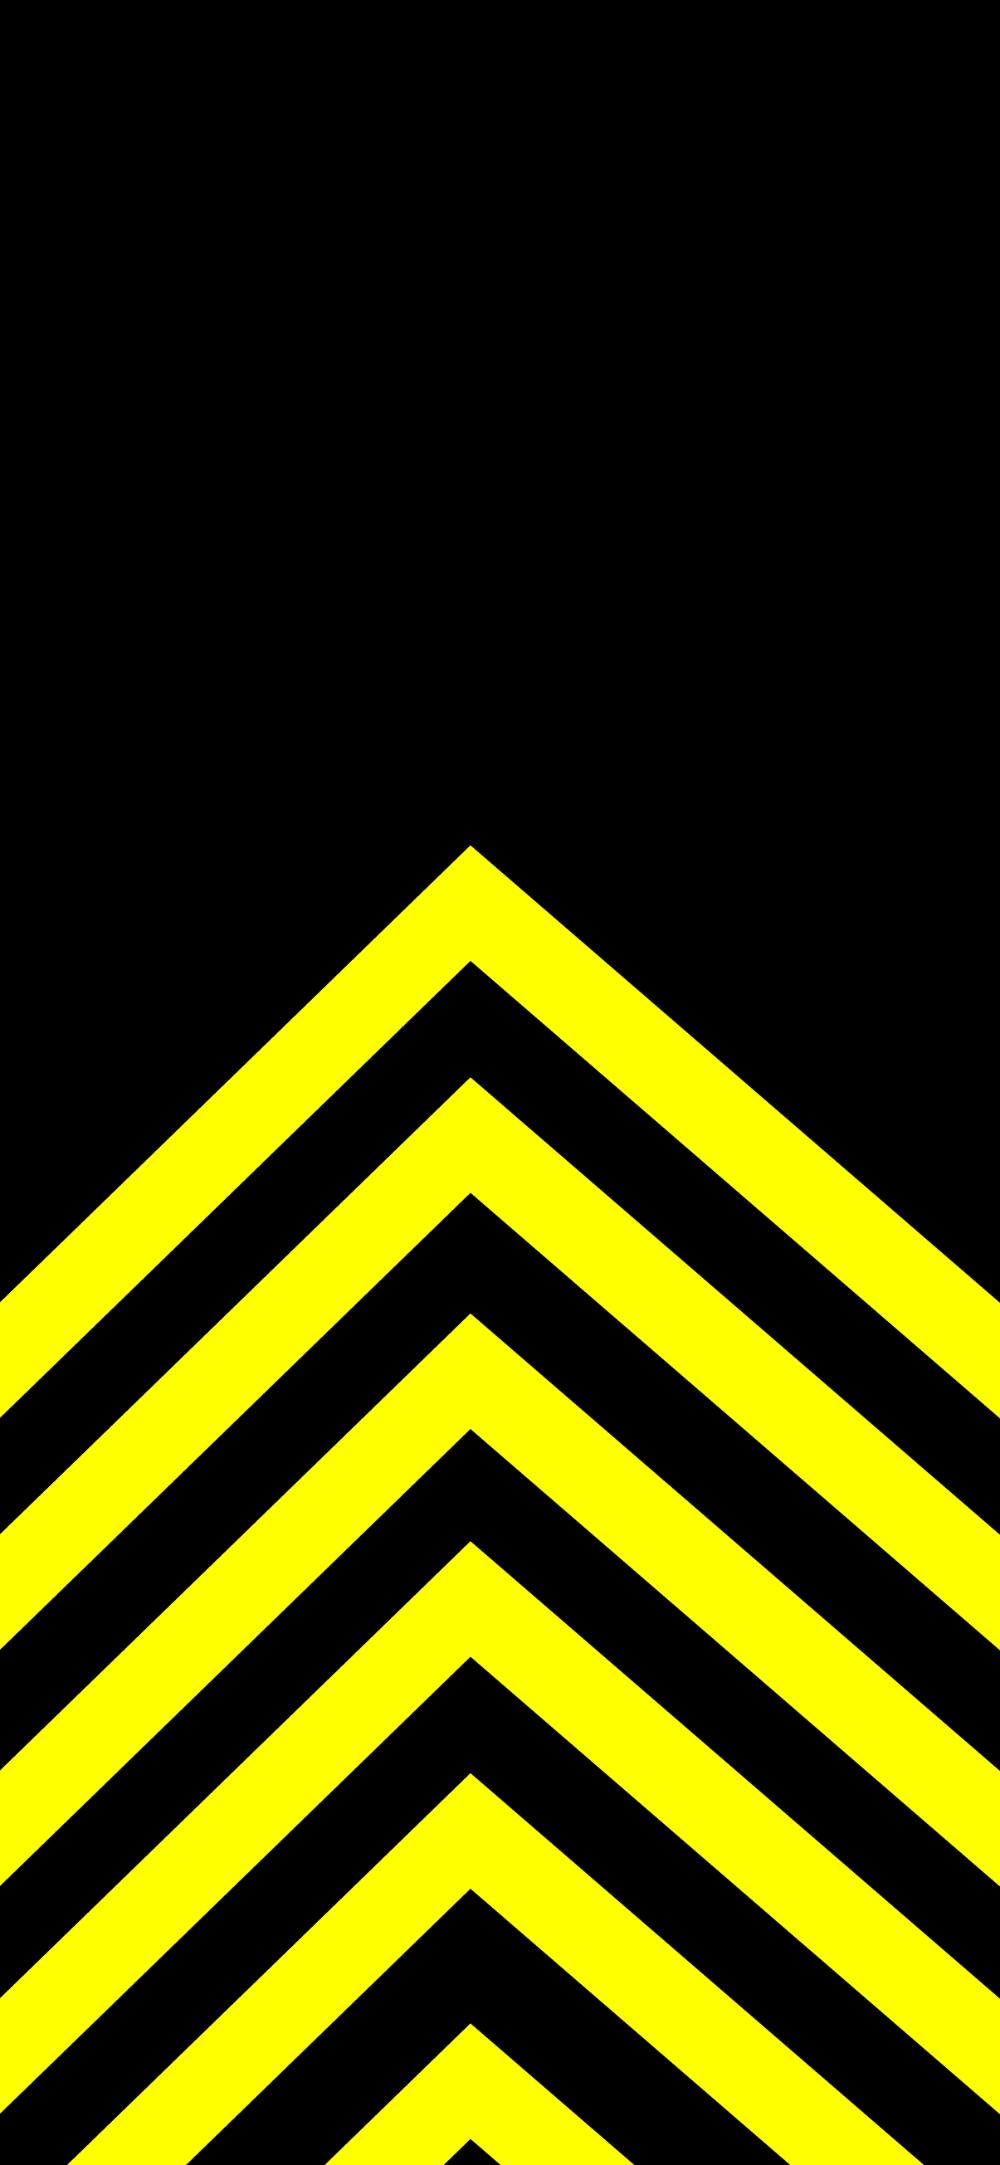 Yellow Stripes Amoled Wallpaper Iphone Wallpaper Yellow Wallpaper Cool Wallpaper